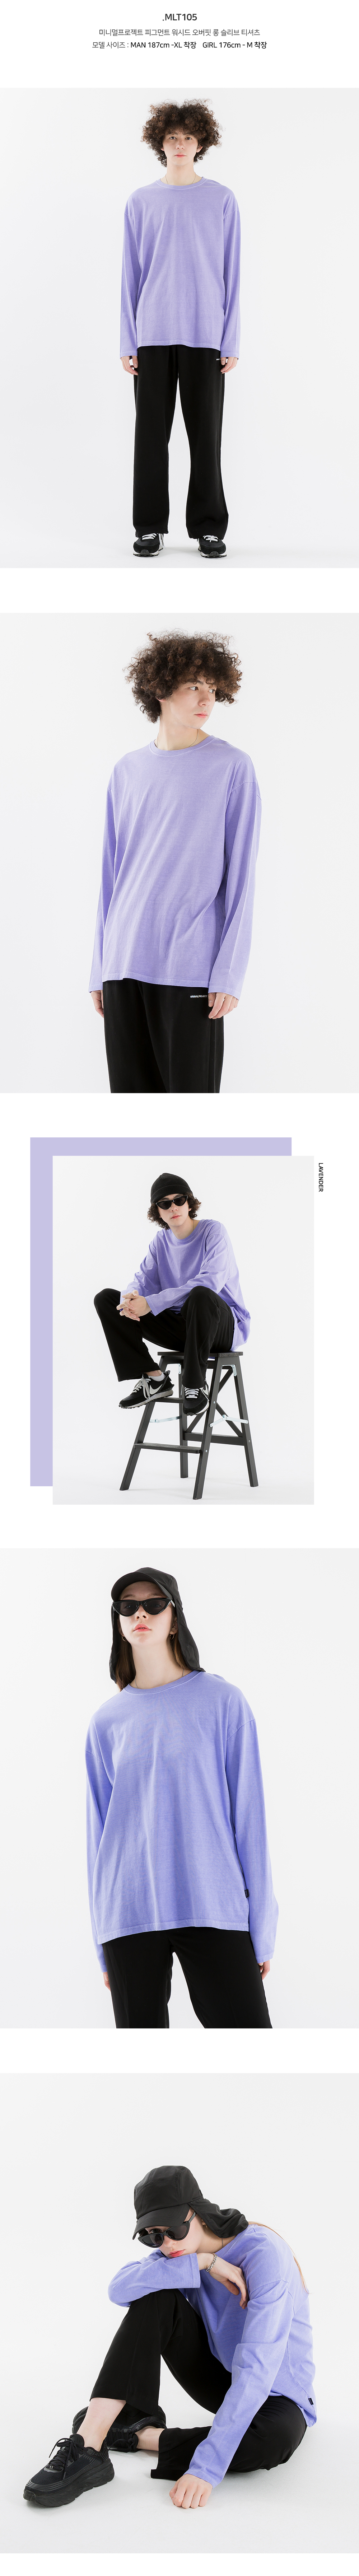 [minimal project] 미니멀프로젝트 피그먼트 워시드 오버핏 롱 슬리브 티셔츠 MLT105 [LAVENDER]